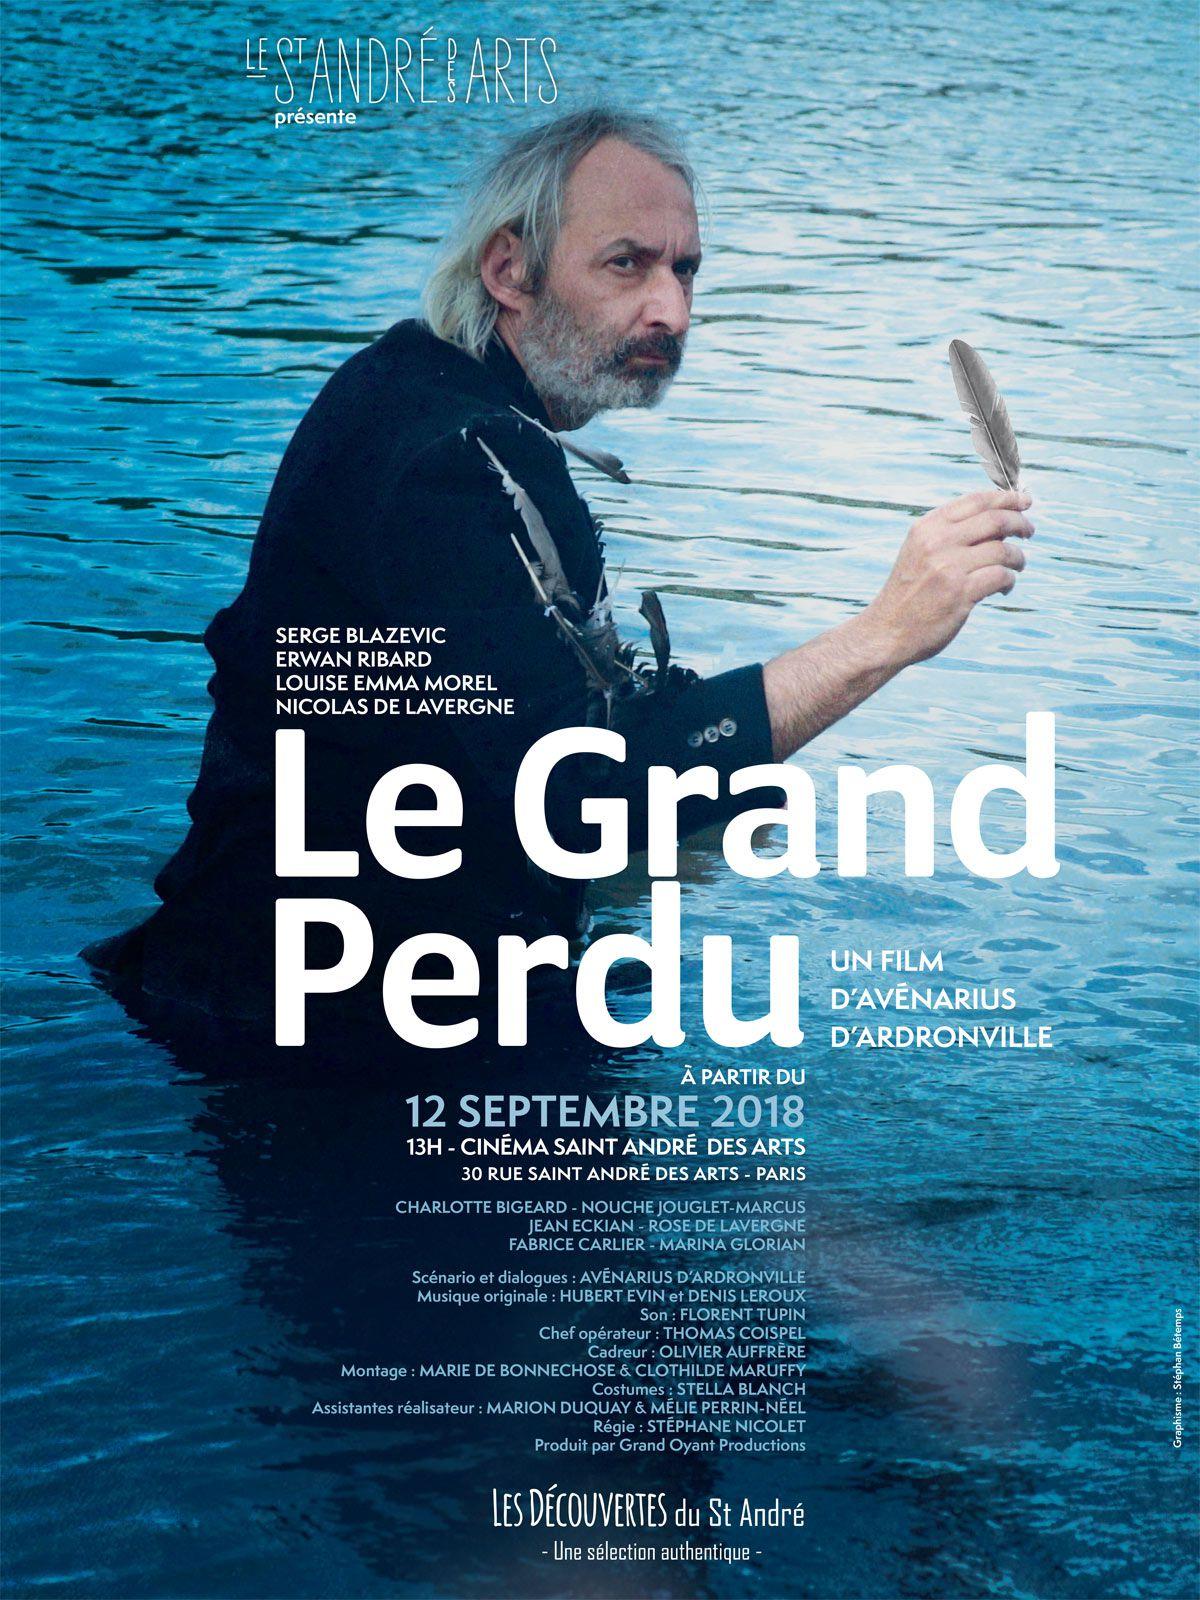 Le Grand Perdu - Film (2018)